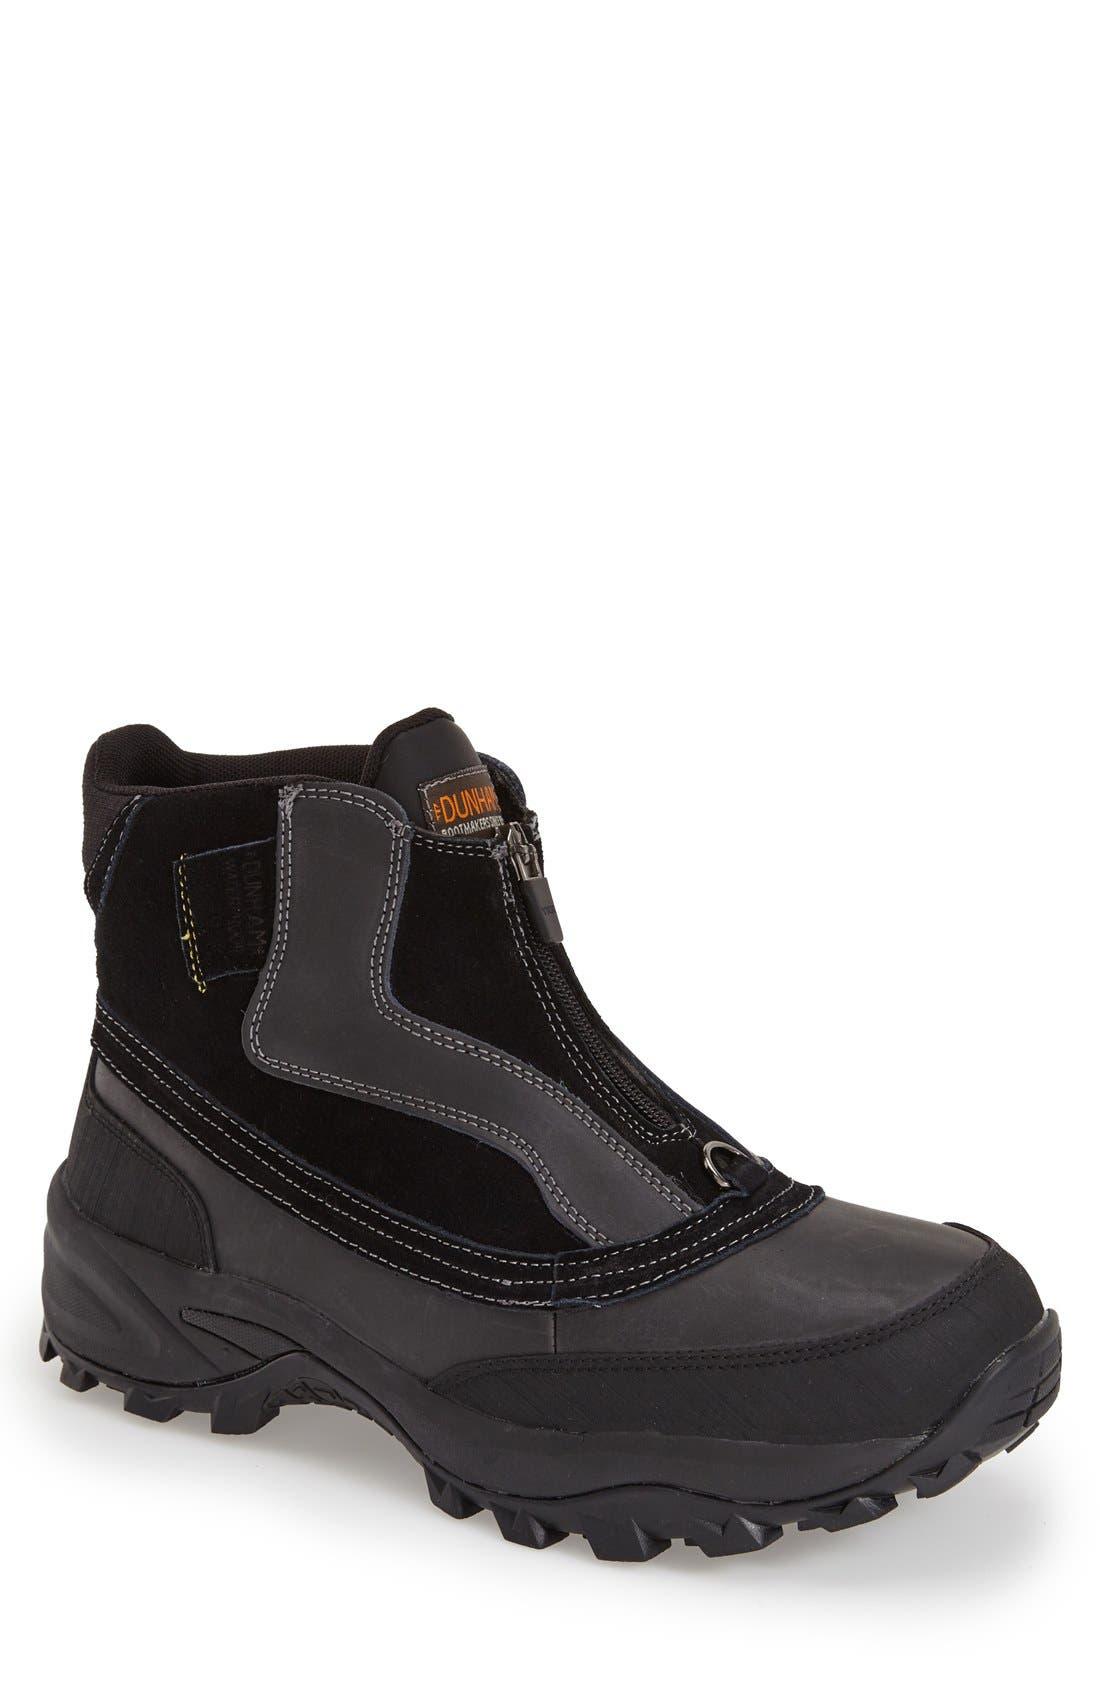 Dunham 'Tony' Waterproof Snow Boot (Men)